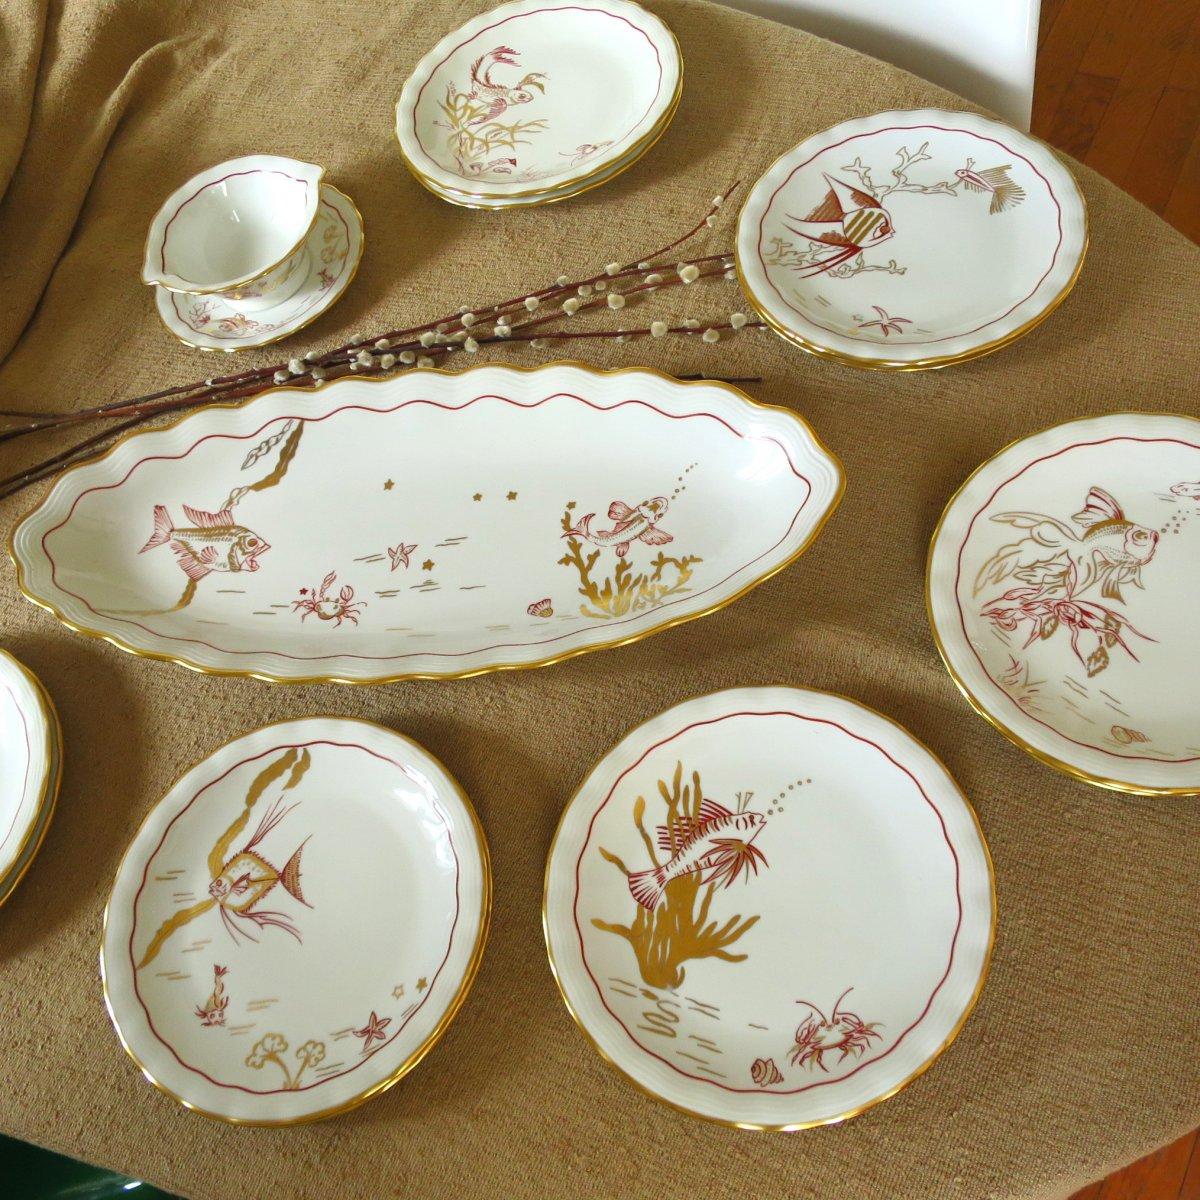 Hand Decorated Limoges Porcelain Fish Service